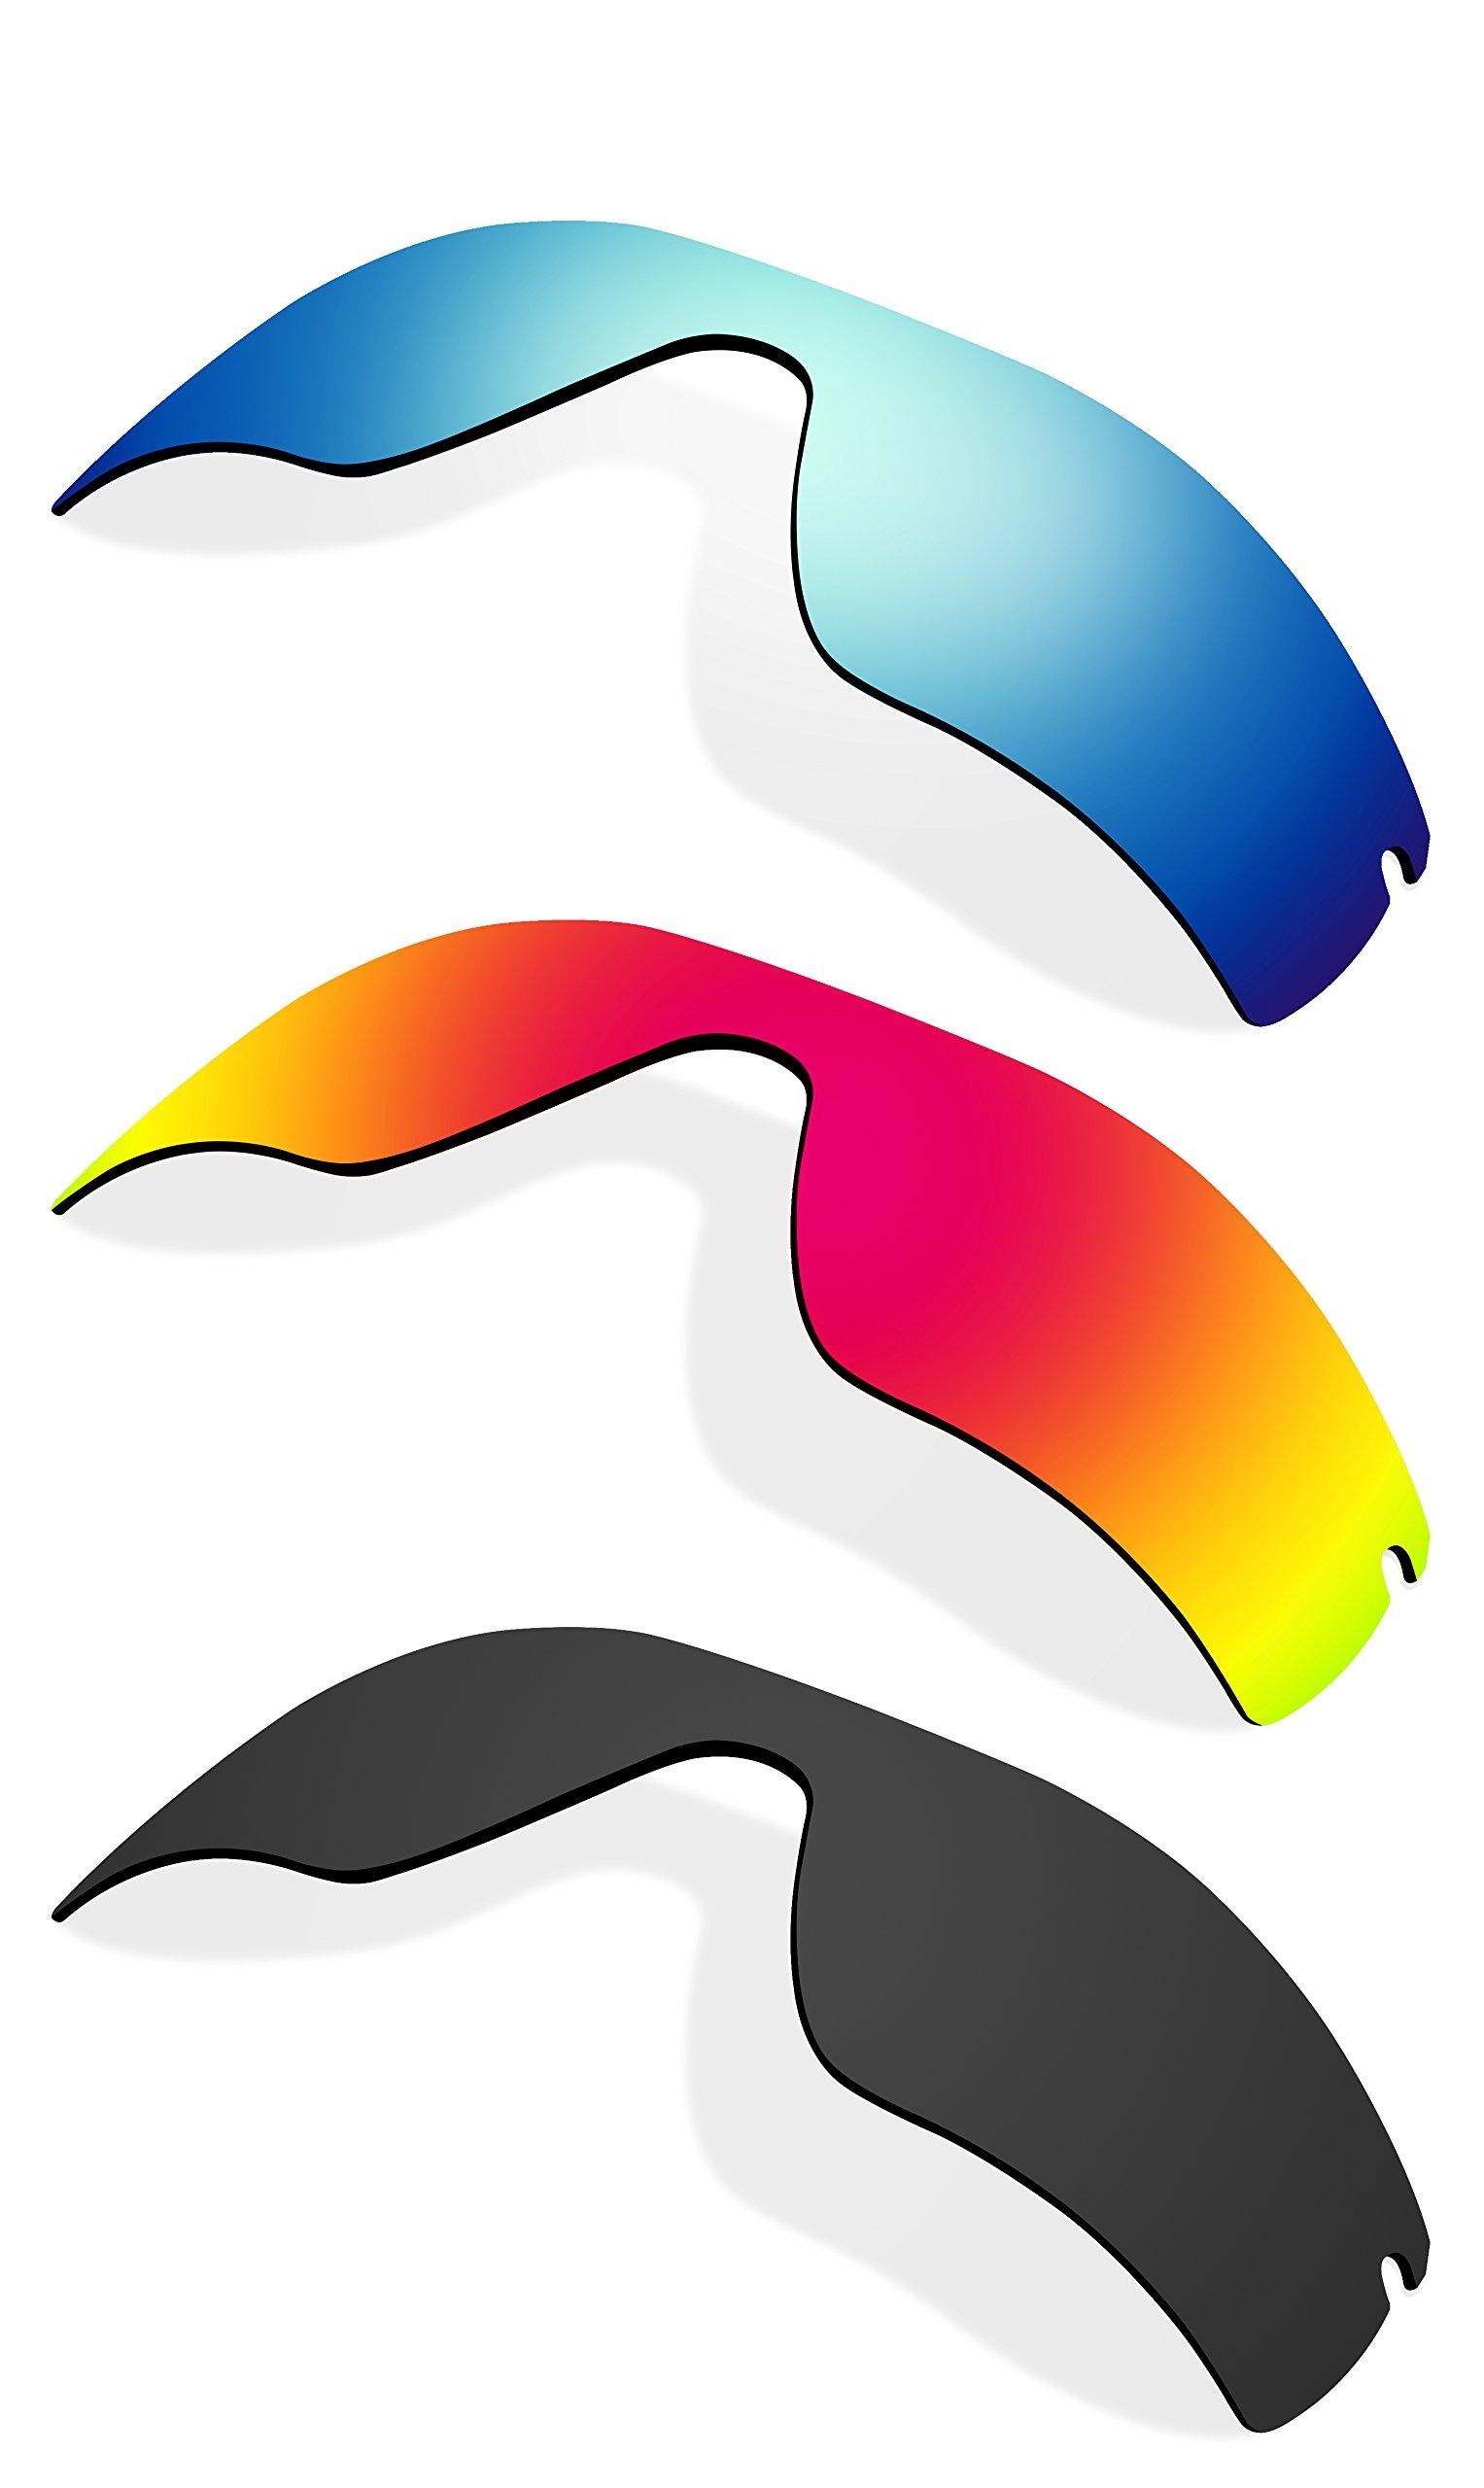 Littlebird4 3 Pairs Polarized Replacement Lenses for Oakley Radar Path Sunglasses - Multiple Options (Black-Orange-Ice Blue)